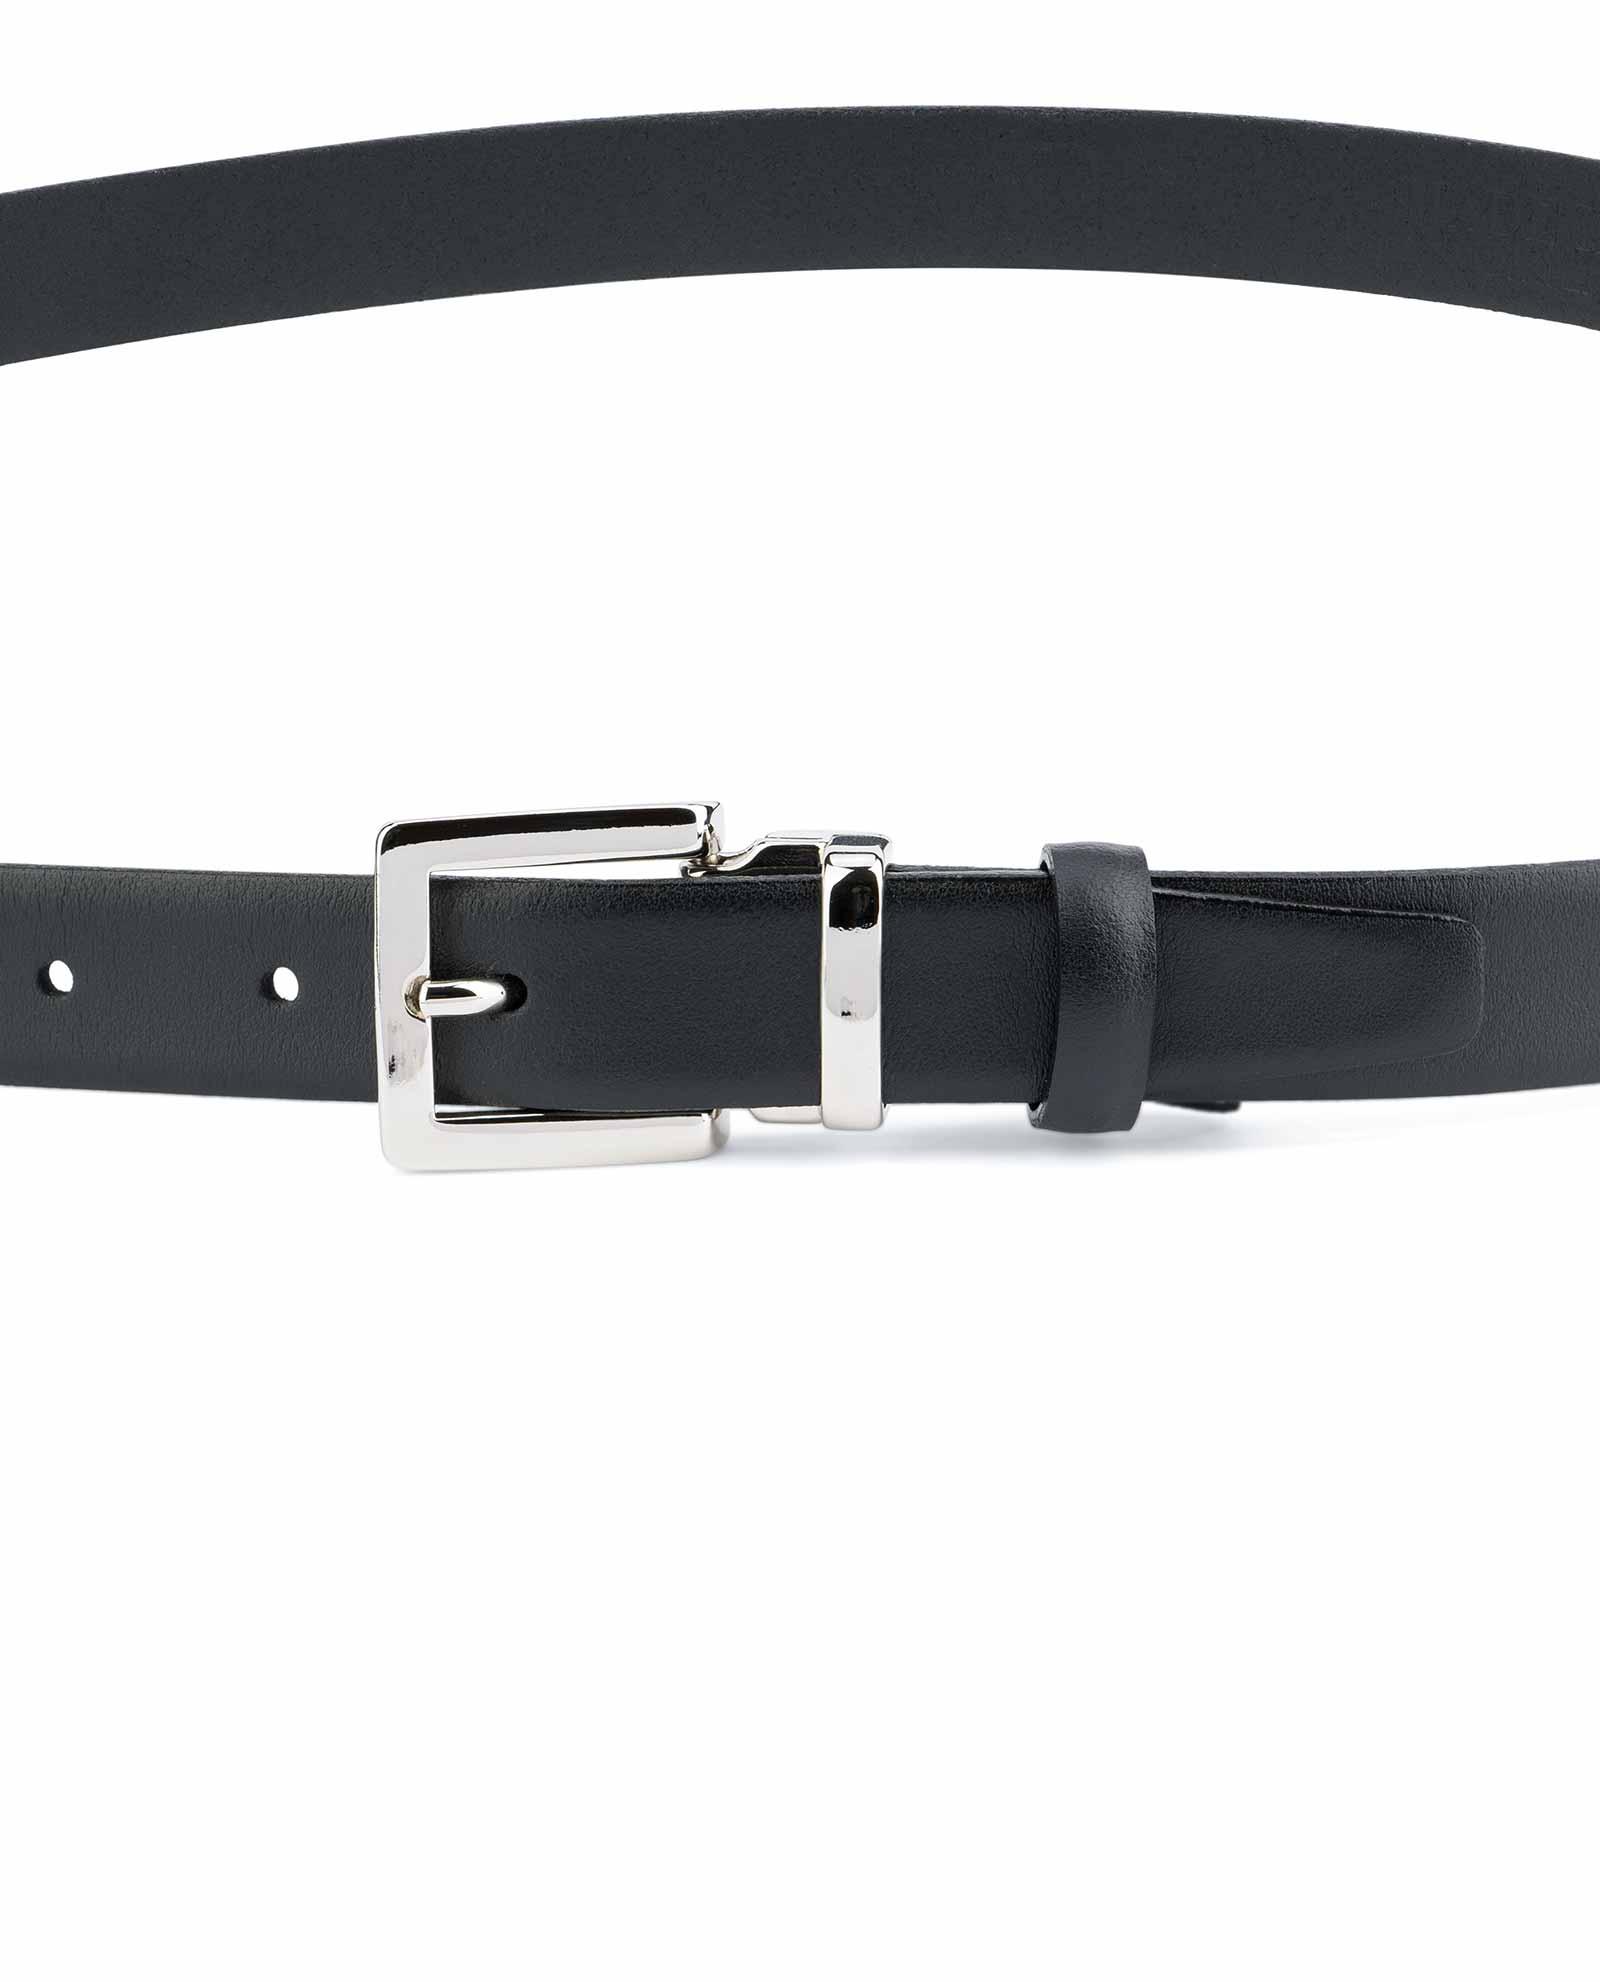 1-inch-Black-Leather-Belt-25-mm-Italian-Buckle-On-pants